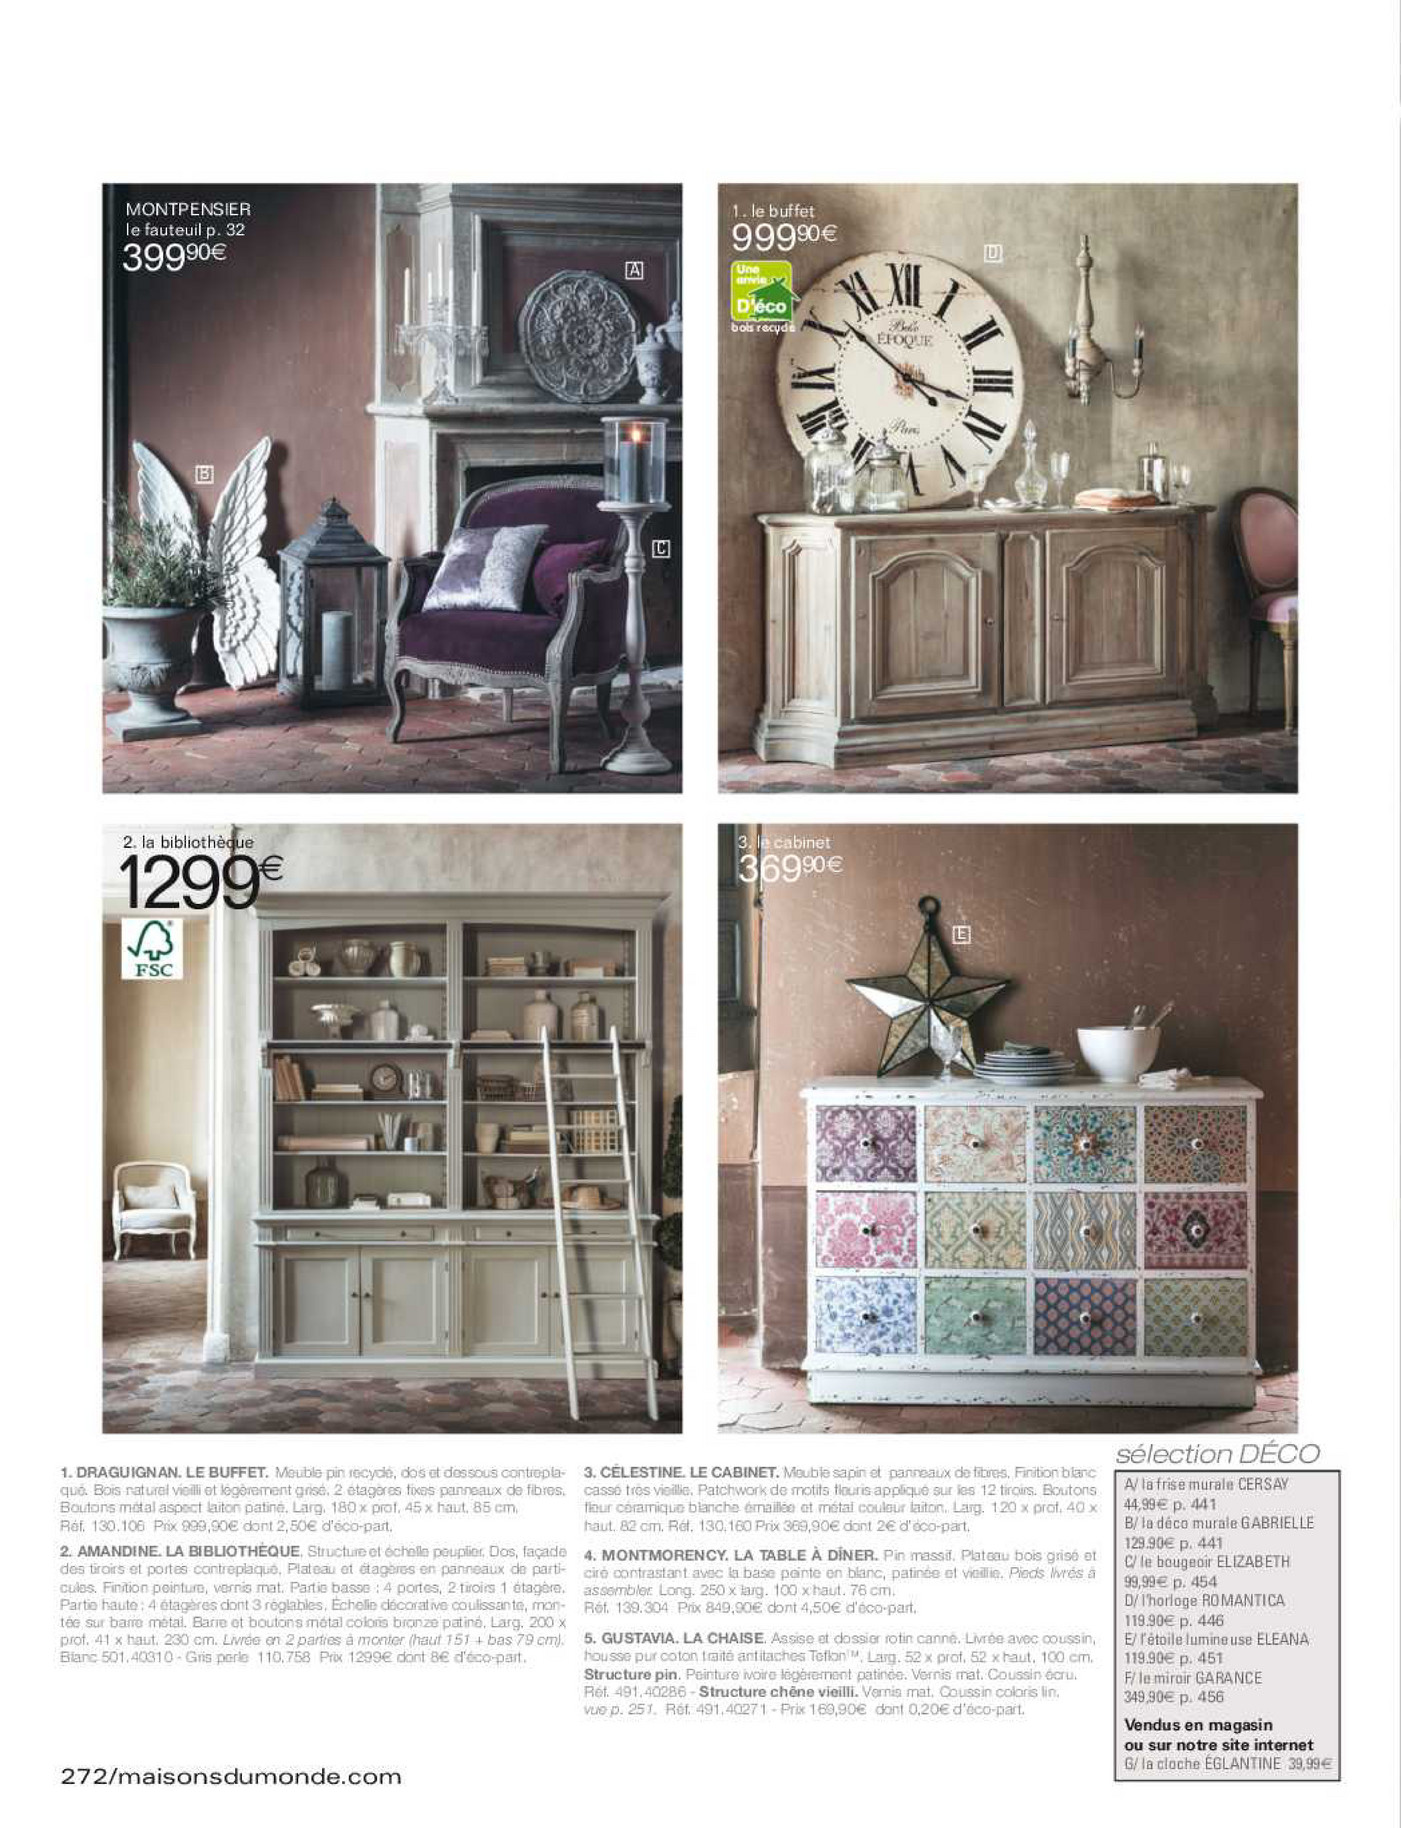 volantinofacile catalogo maisons du monde 2015 pagina. Black Bedroom Furniture Sets. Home Design Ideas